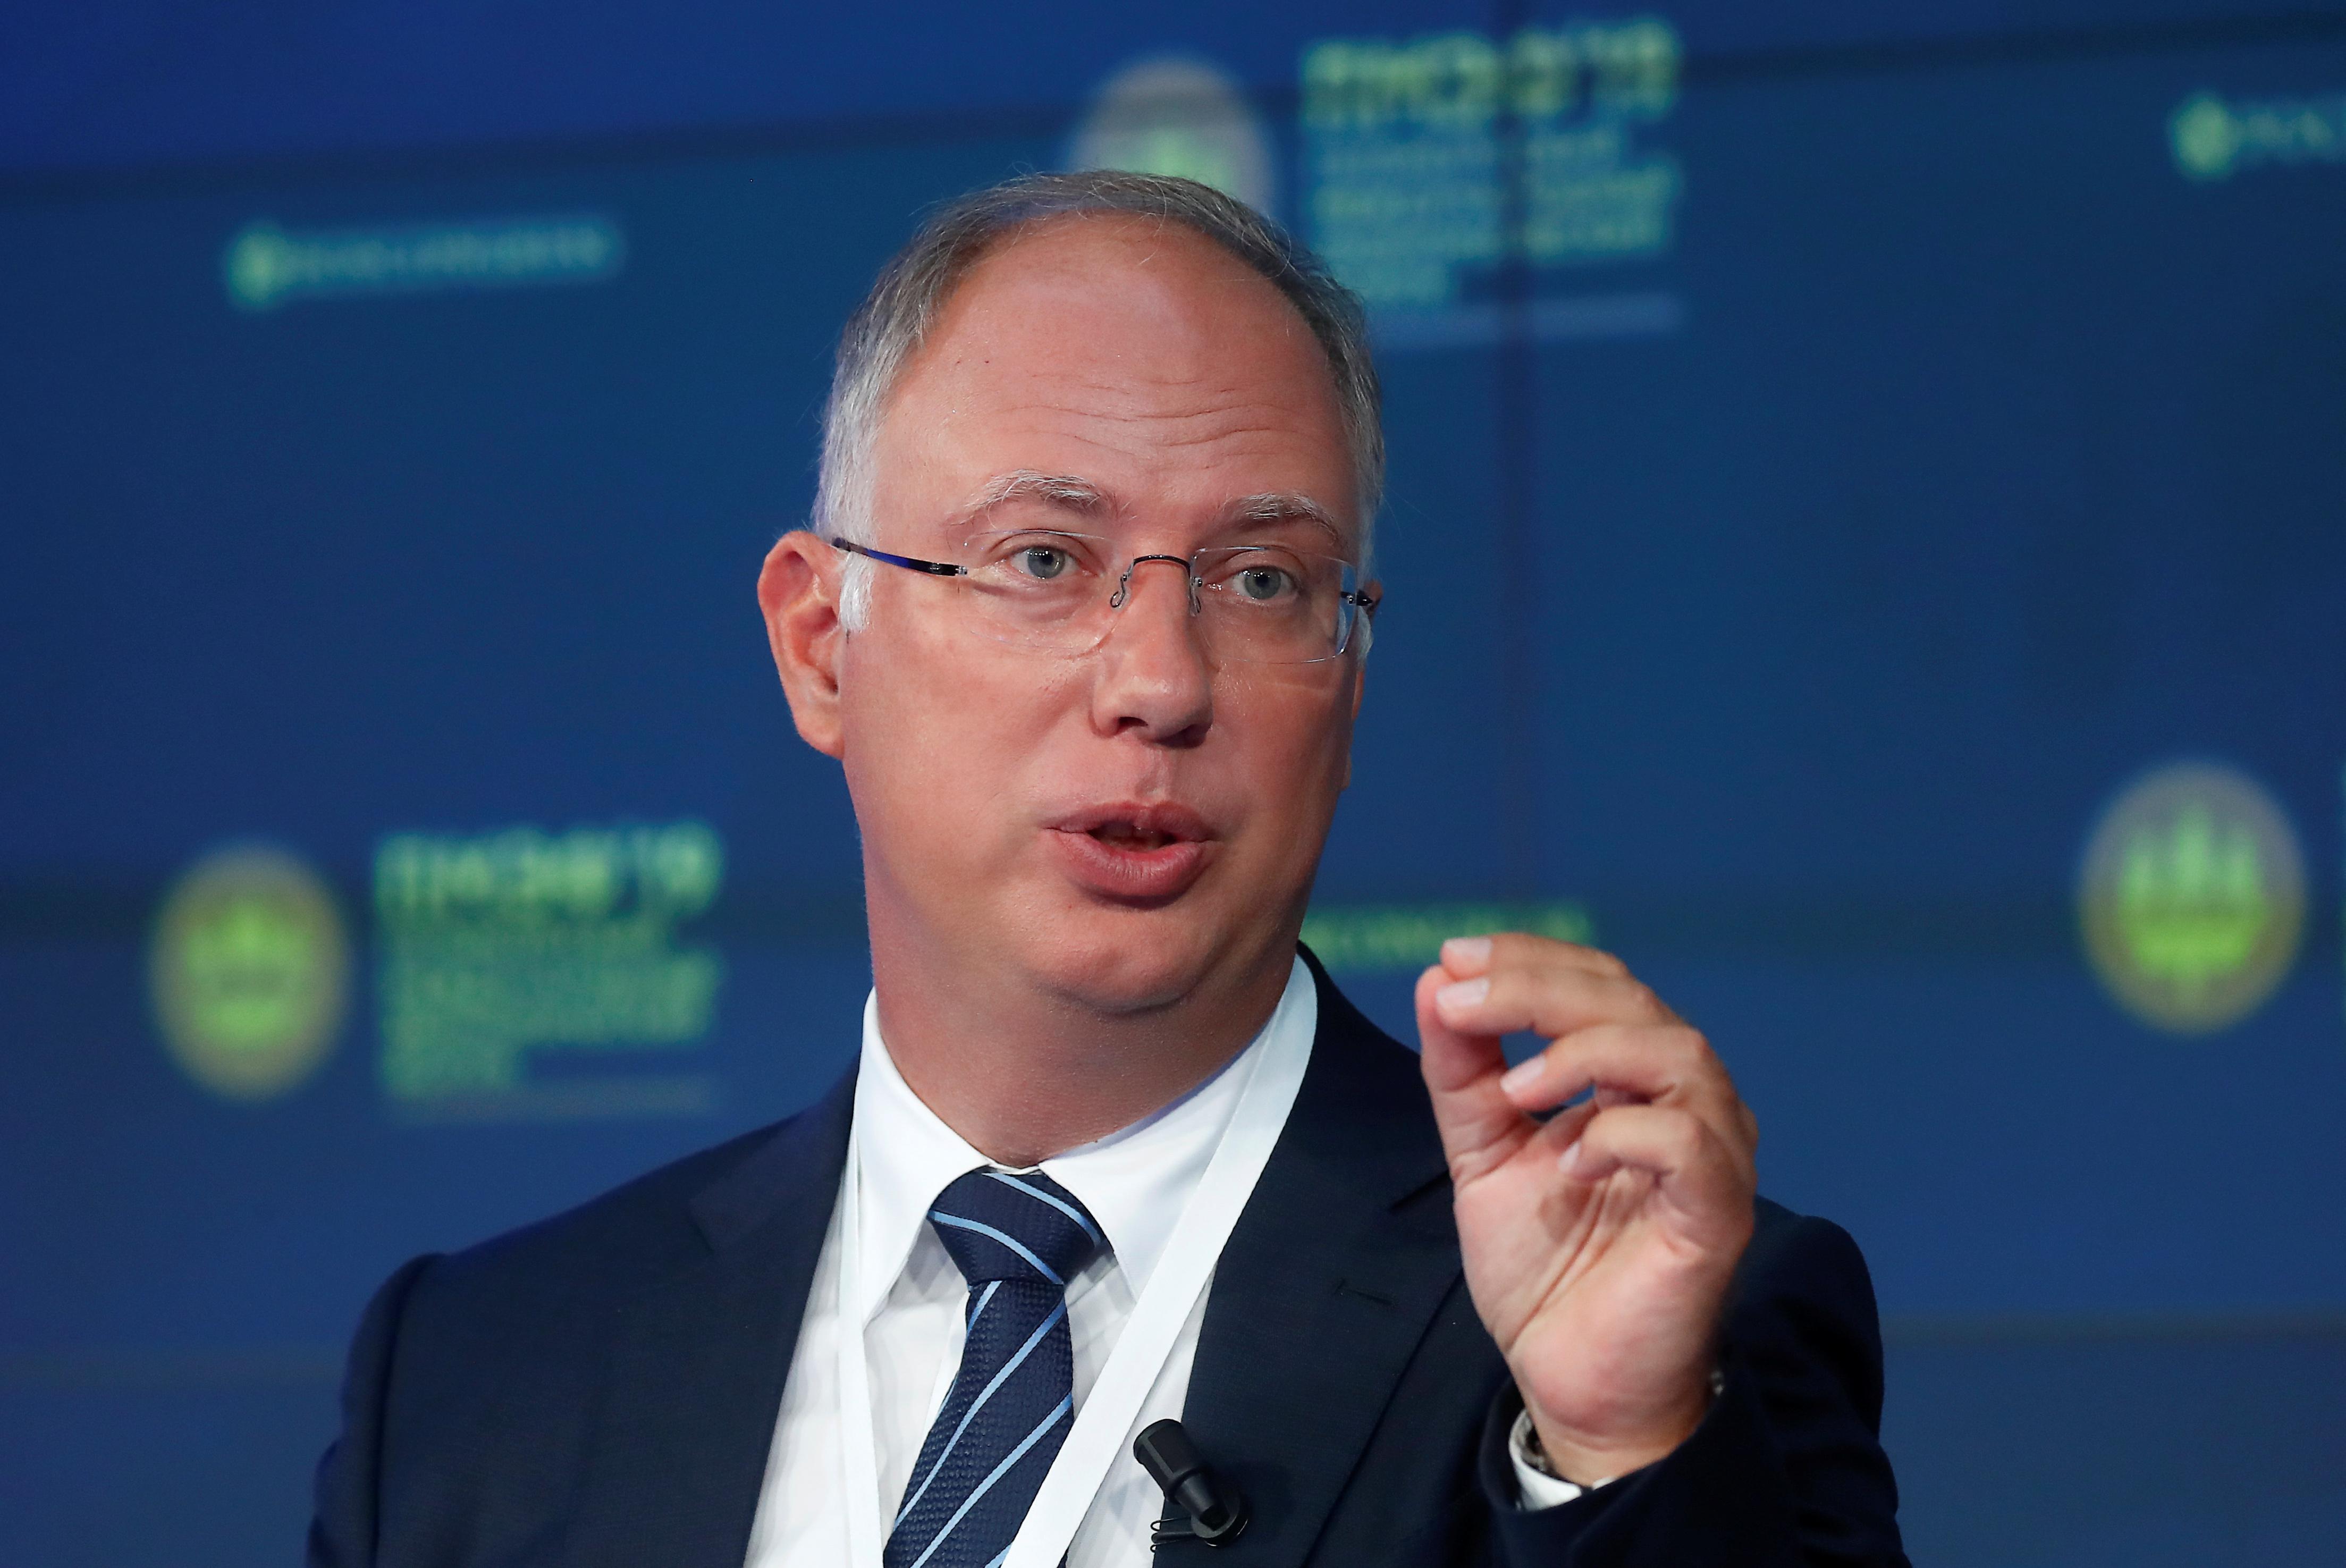 Russian investors eyeing Saudi Aramco listing - wealth fund chief